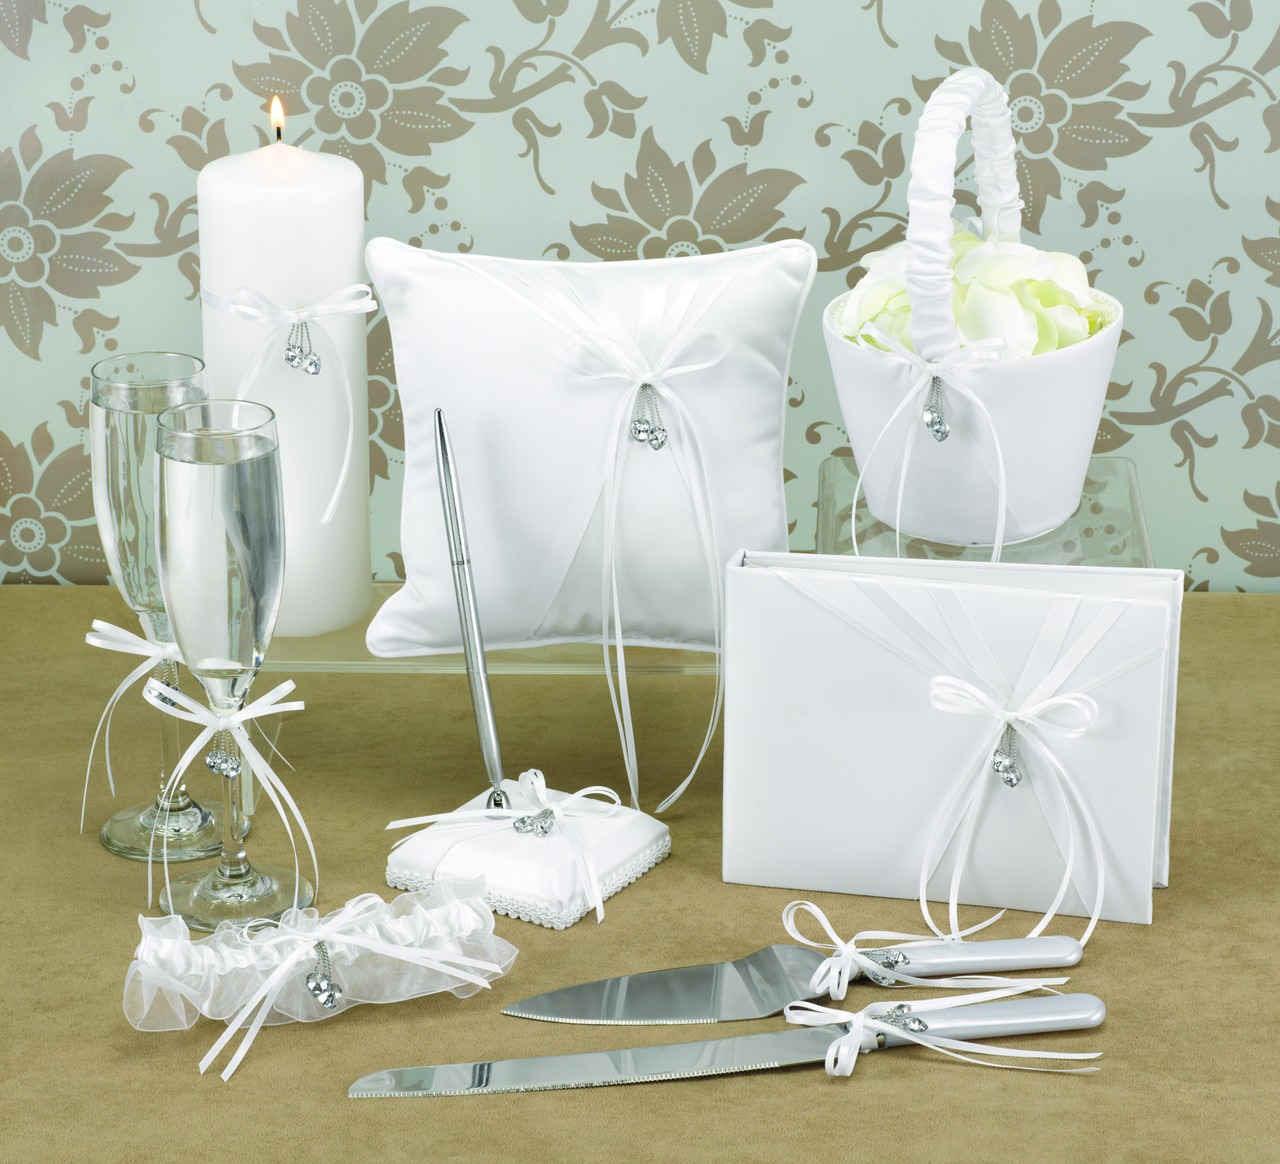 Koyal Whole Diy Wedding Supplies